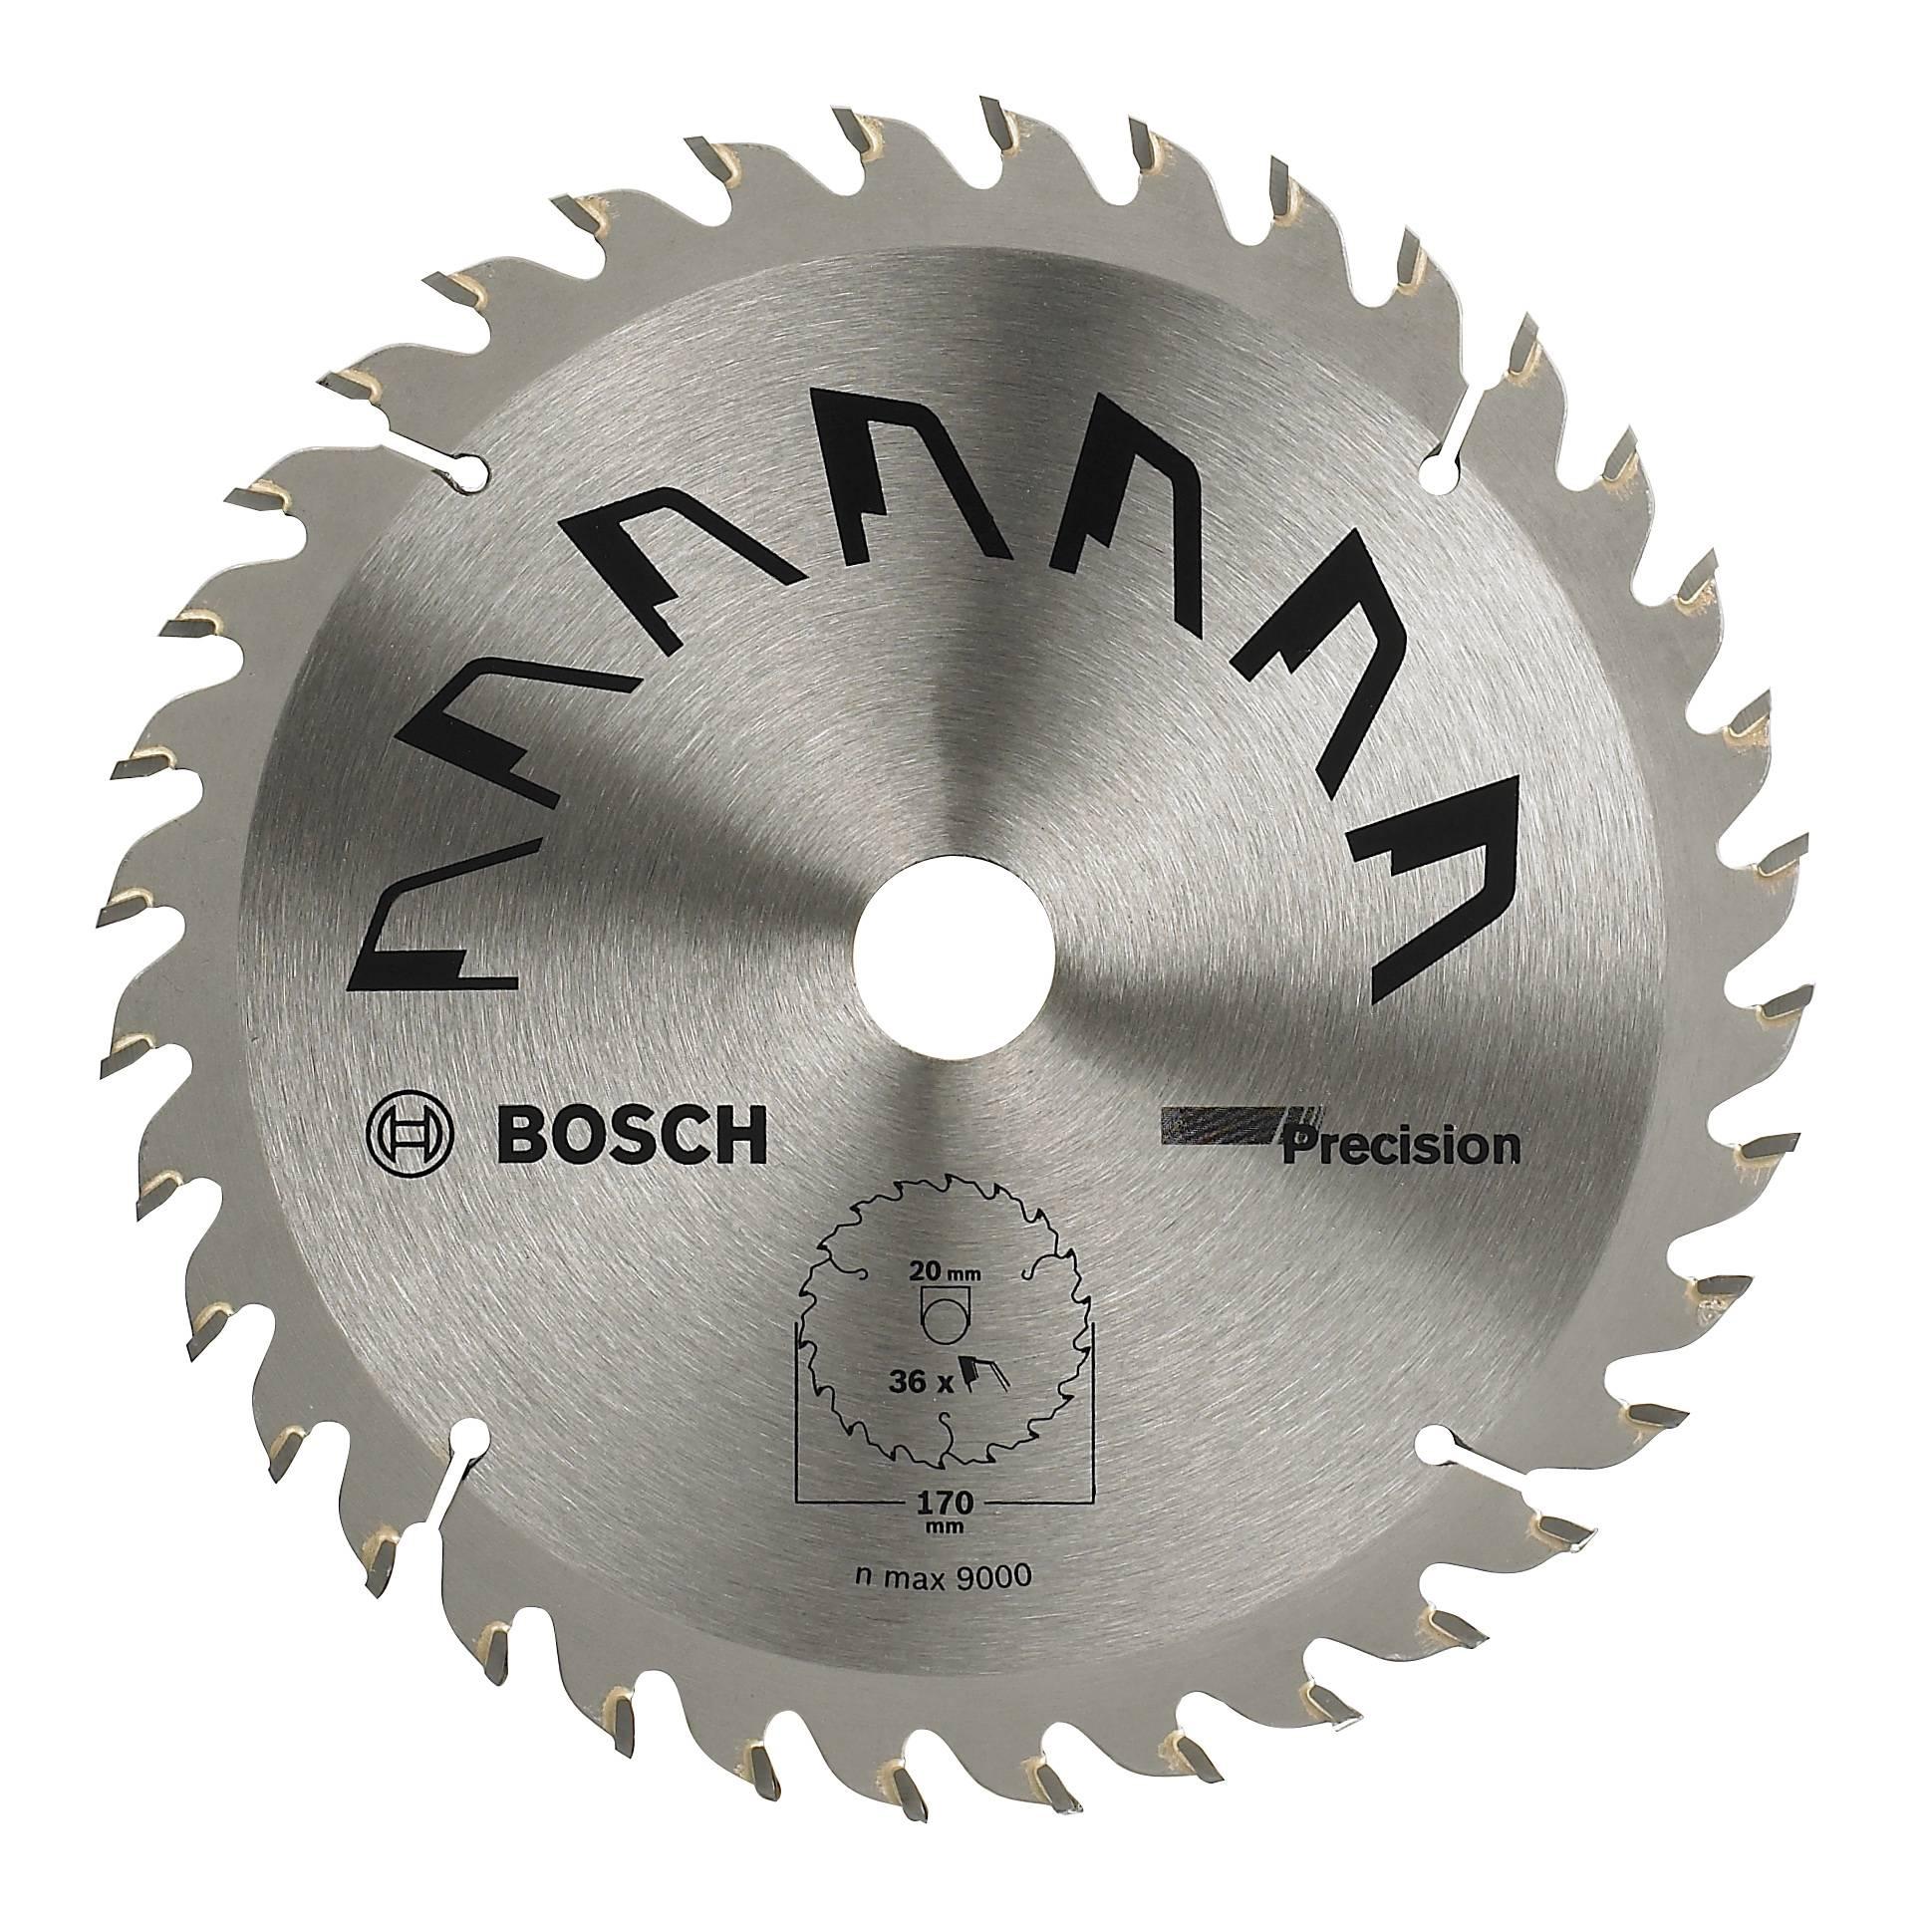 Lame de scie circulaire au carbure Bosch Accessories Precision 2609256858  170 x 20 mm Nombre de dents  36 1 pc(s)   Conrad.fr 10aa201b04e8